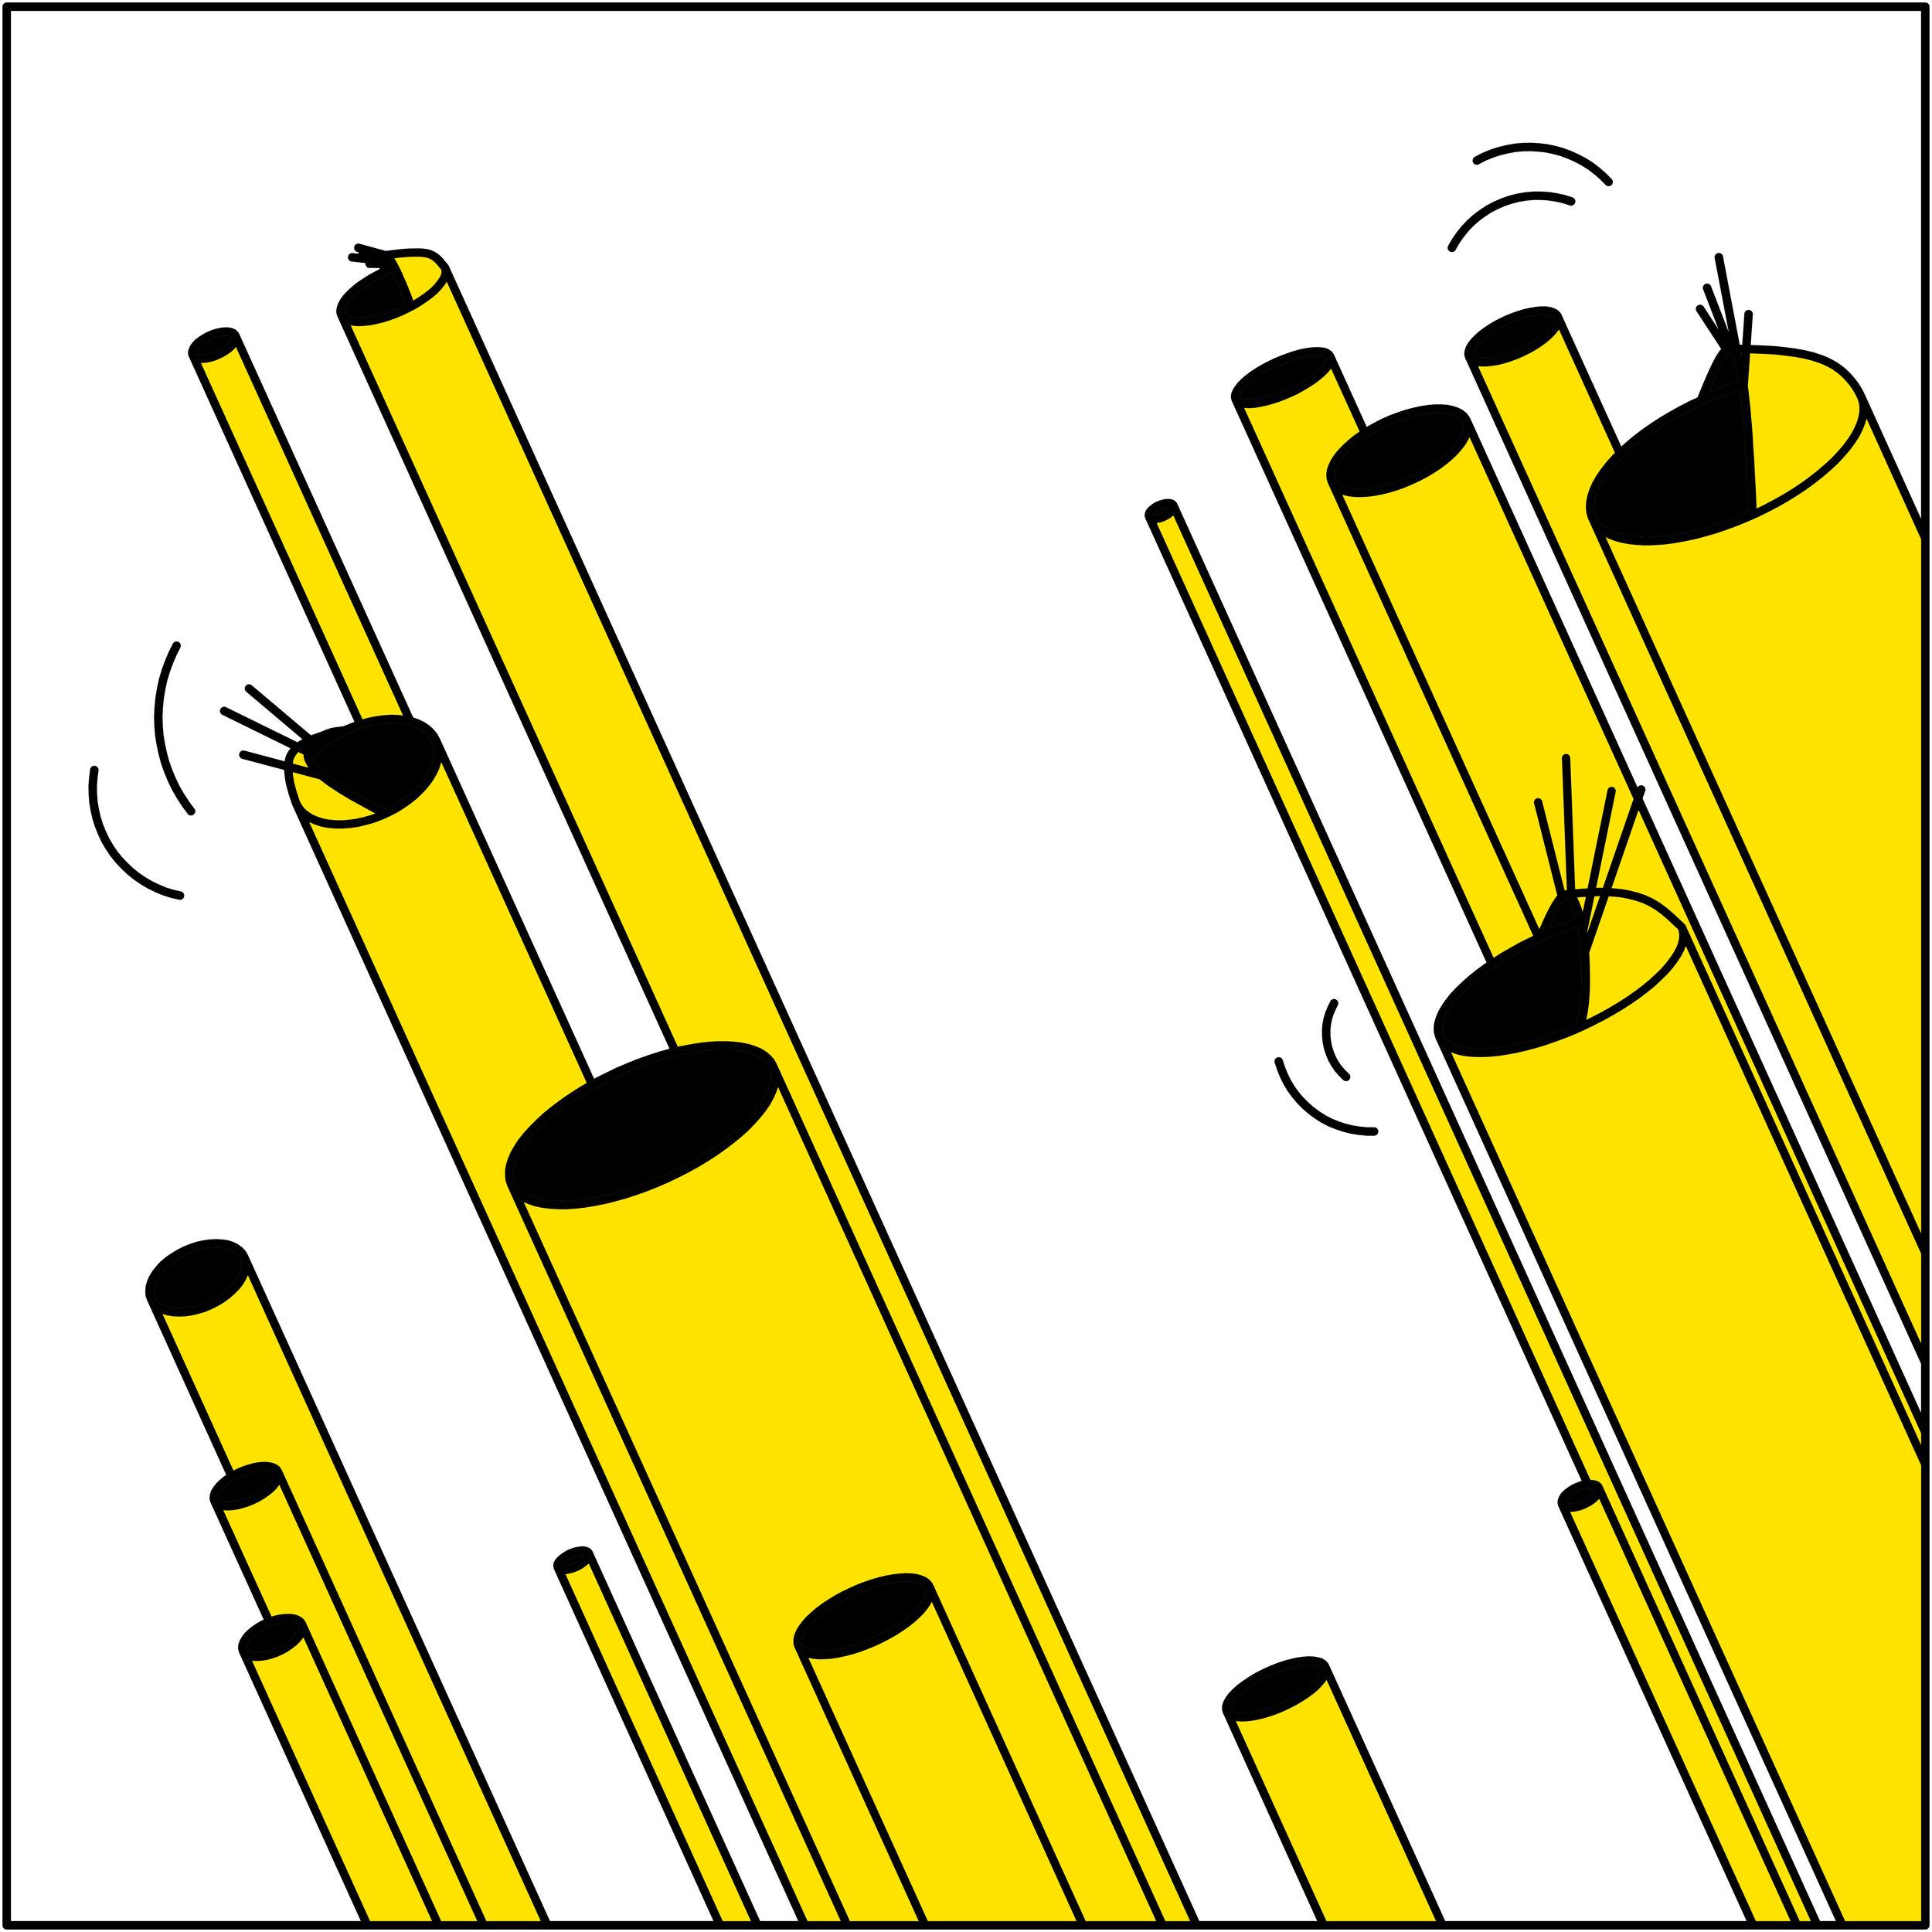 spaghetti yellow - 013.jpg